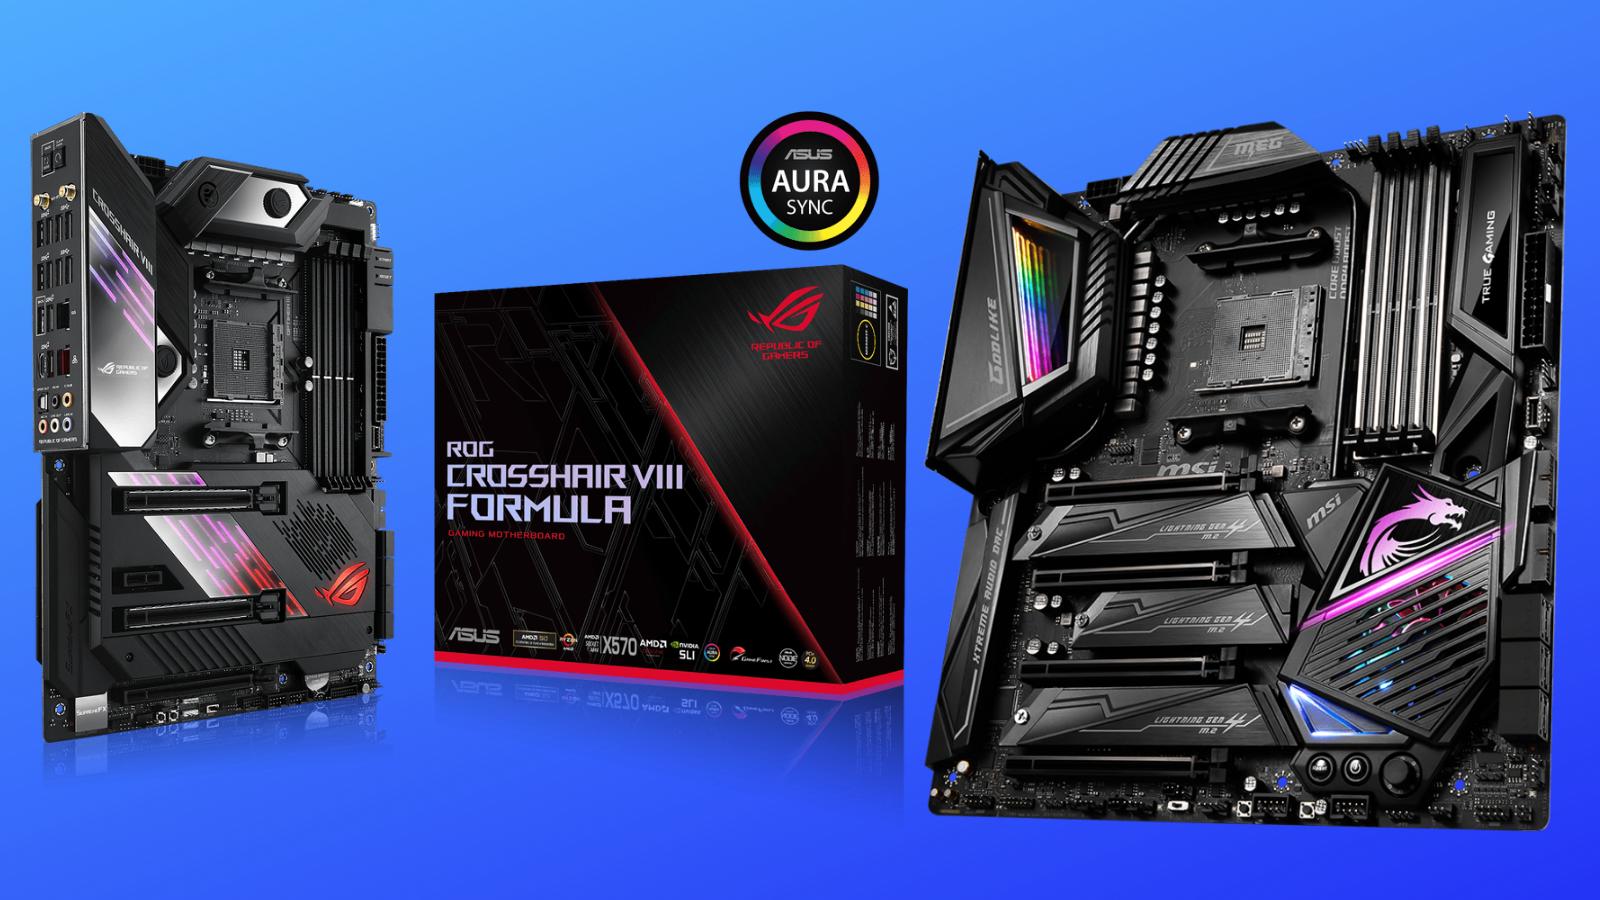 10 Best X570 Motherboards to Buy in 2019 For AMD Ryzen 3000 CPUs